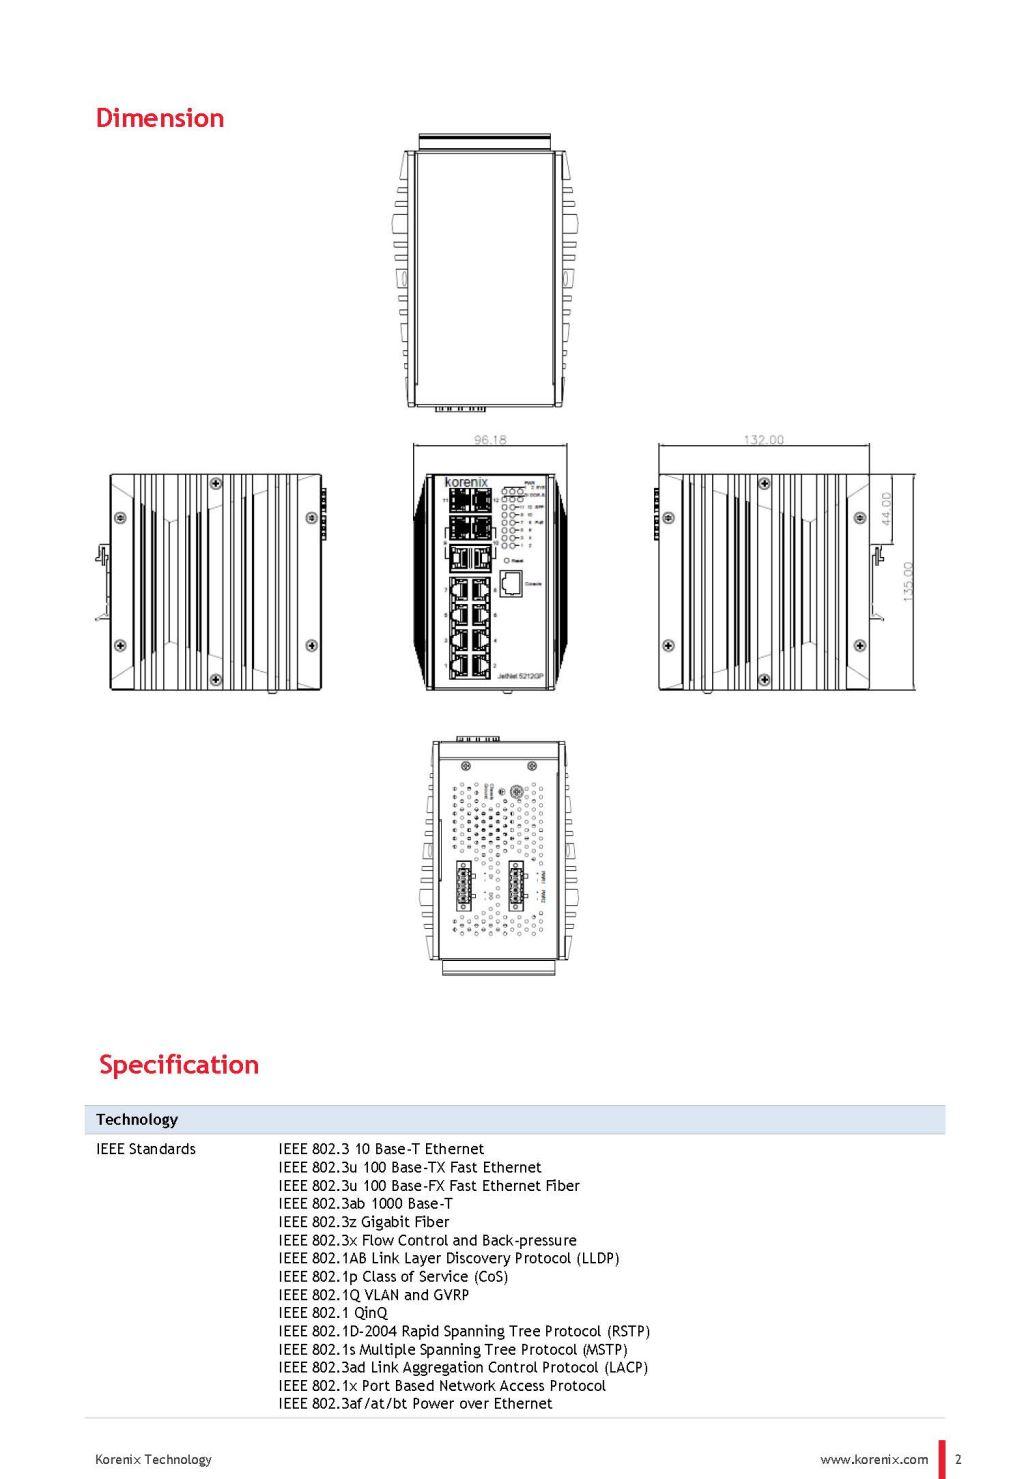 korenix JetNet 5212GP-2C2F Industrial 8G RJ45 + 2G Combo + 2G SFP Managed PoE Switch